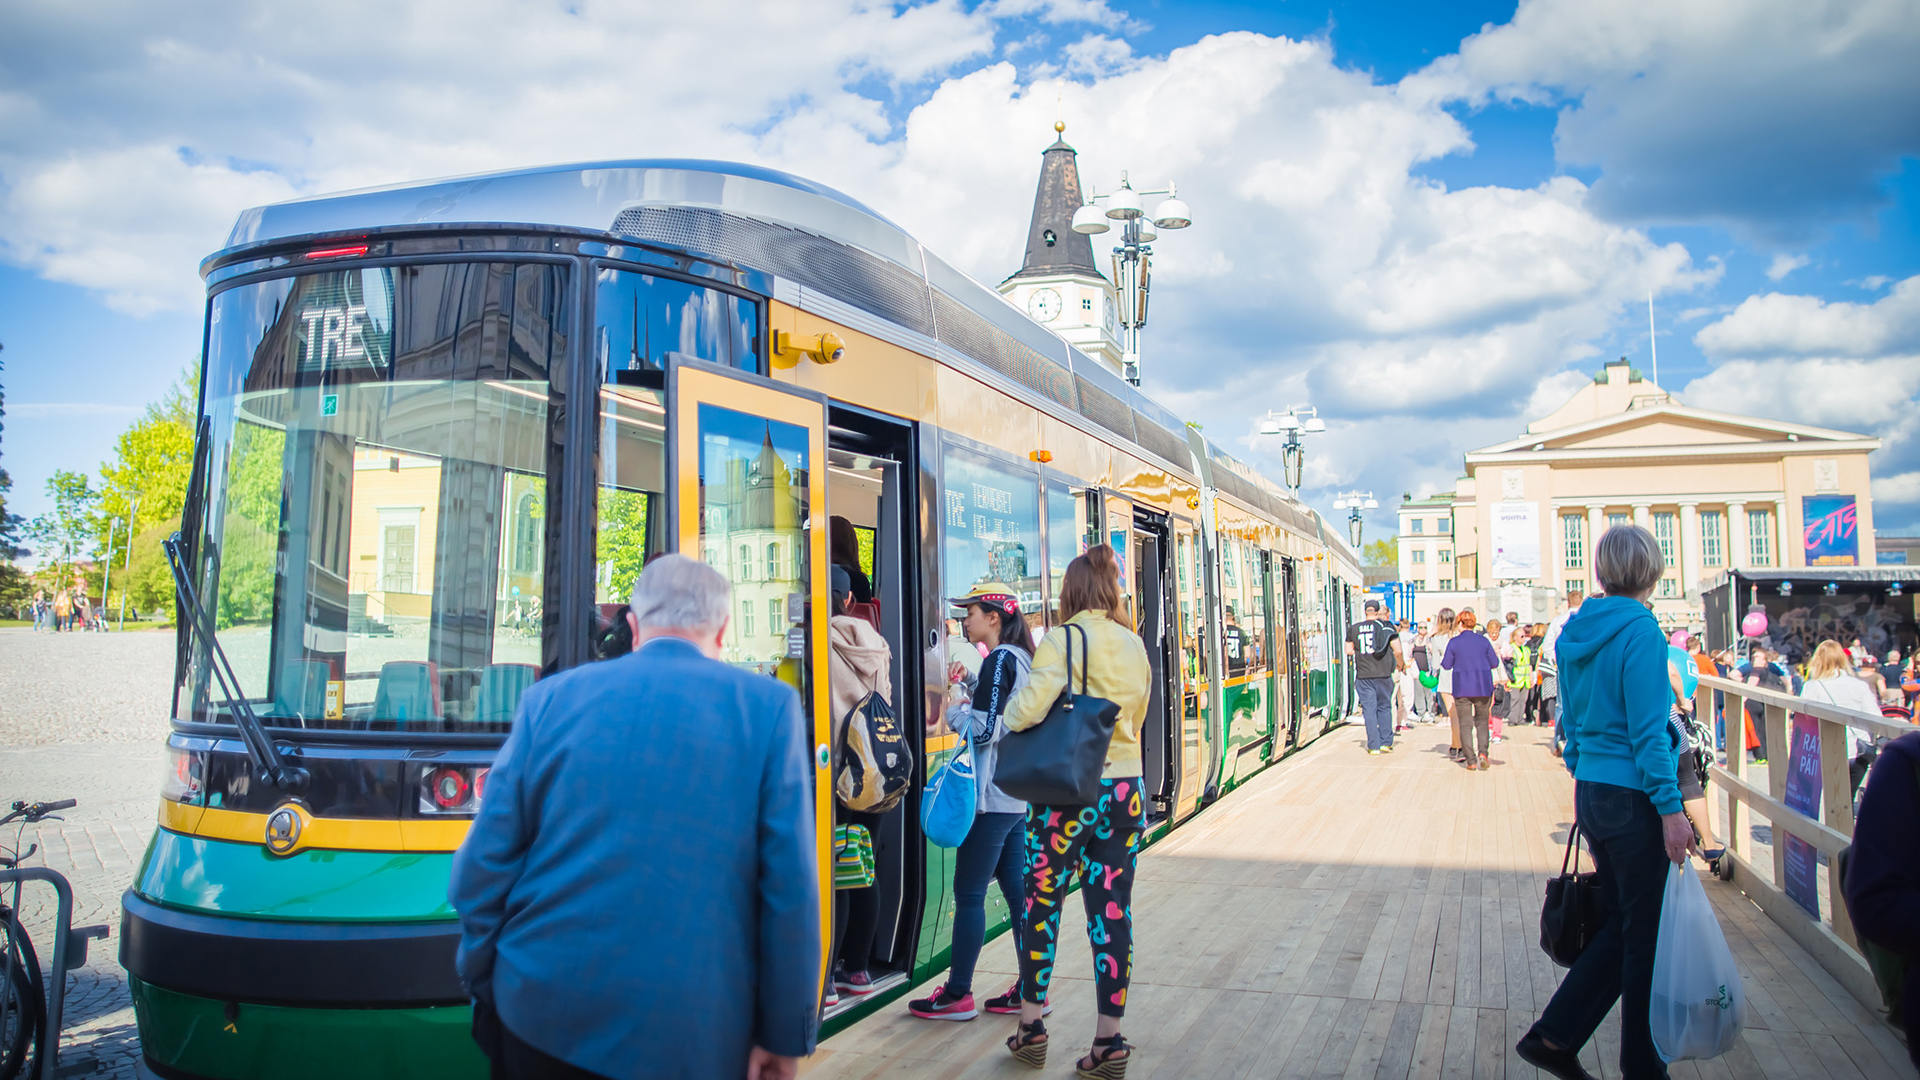 business tampere mobility liikkuminen tram